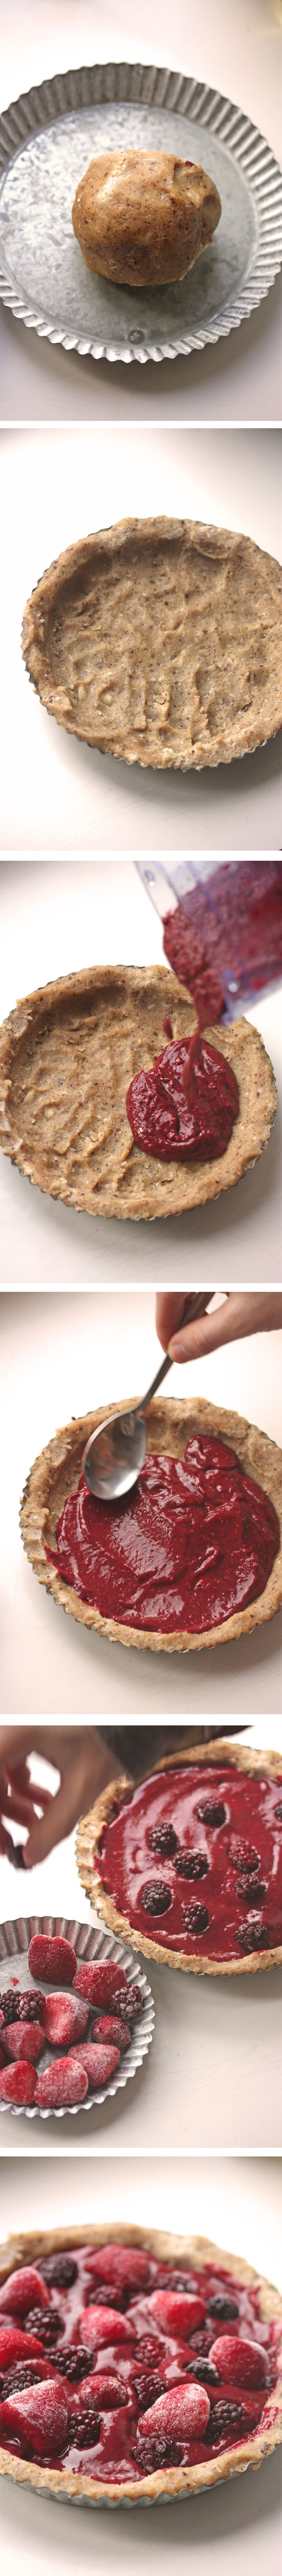 140 best raw foods images on pinterest vegan food vegan recipes raw vegan simple chia pudding pie no bake raw vegan forumfinder Gallery